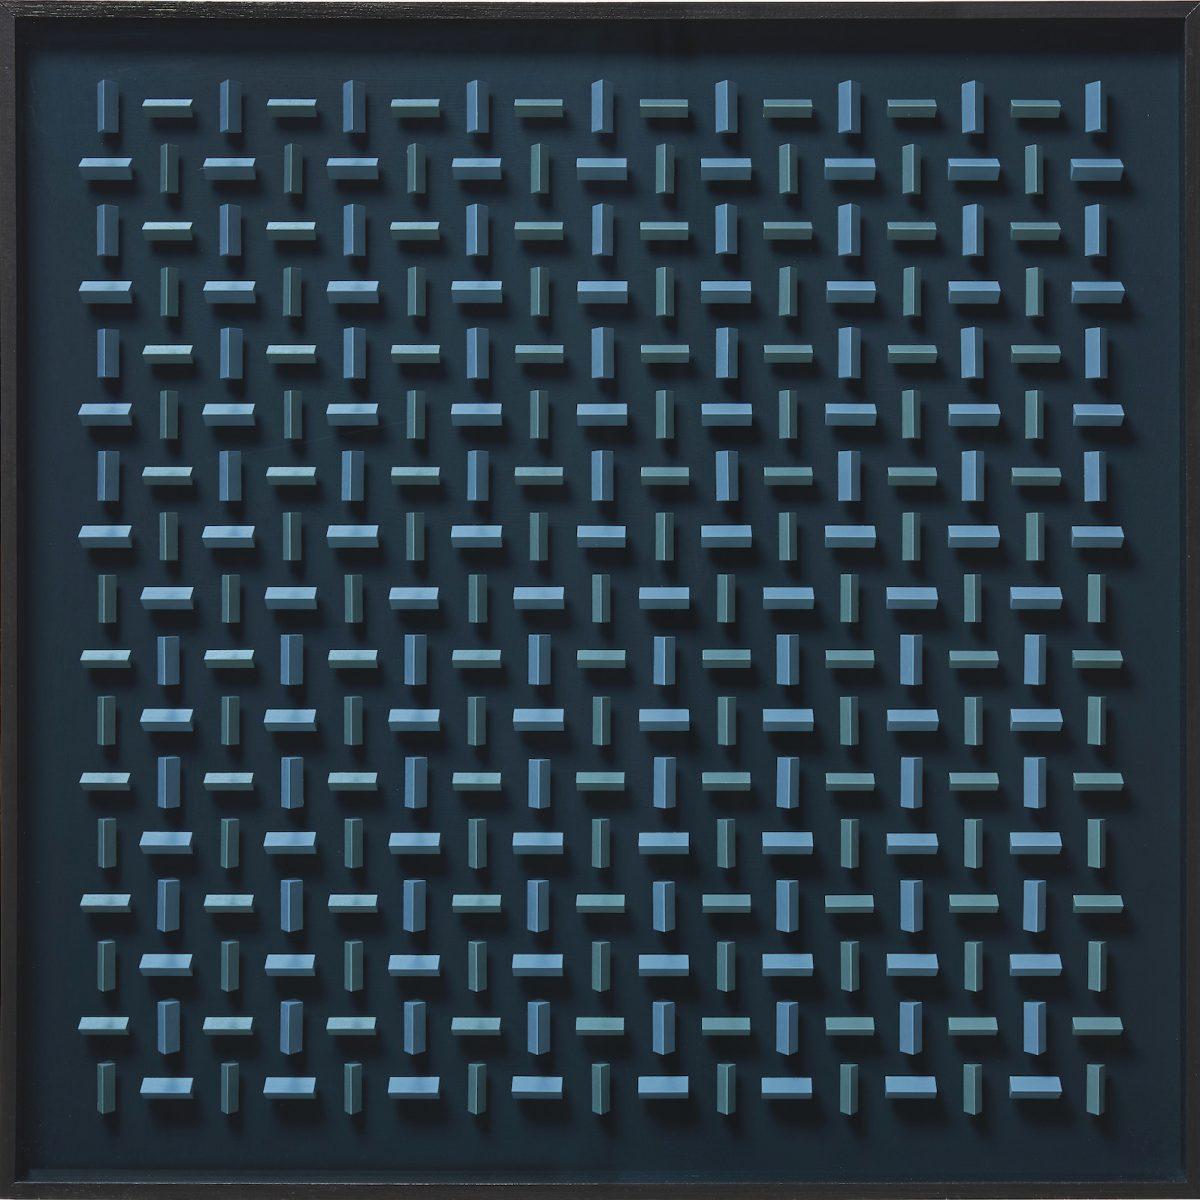 10 Klaus Staudt, Wechsel, 2019, 85 x 85 x 7cm, Holz, Acrylfarbe, Plexiglas; Foto: Norbert Miguletz